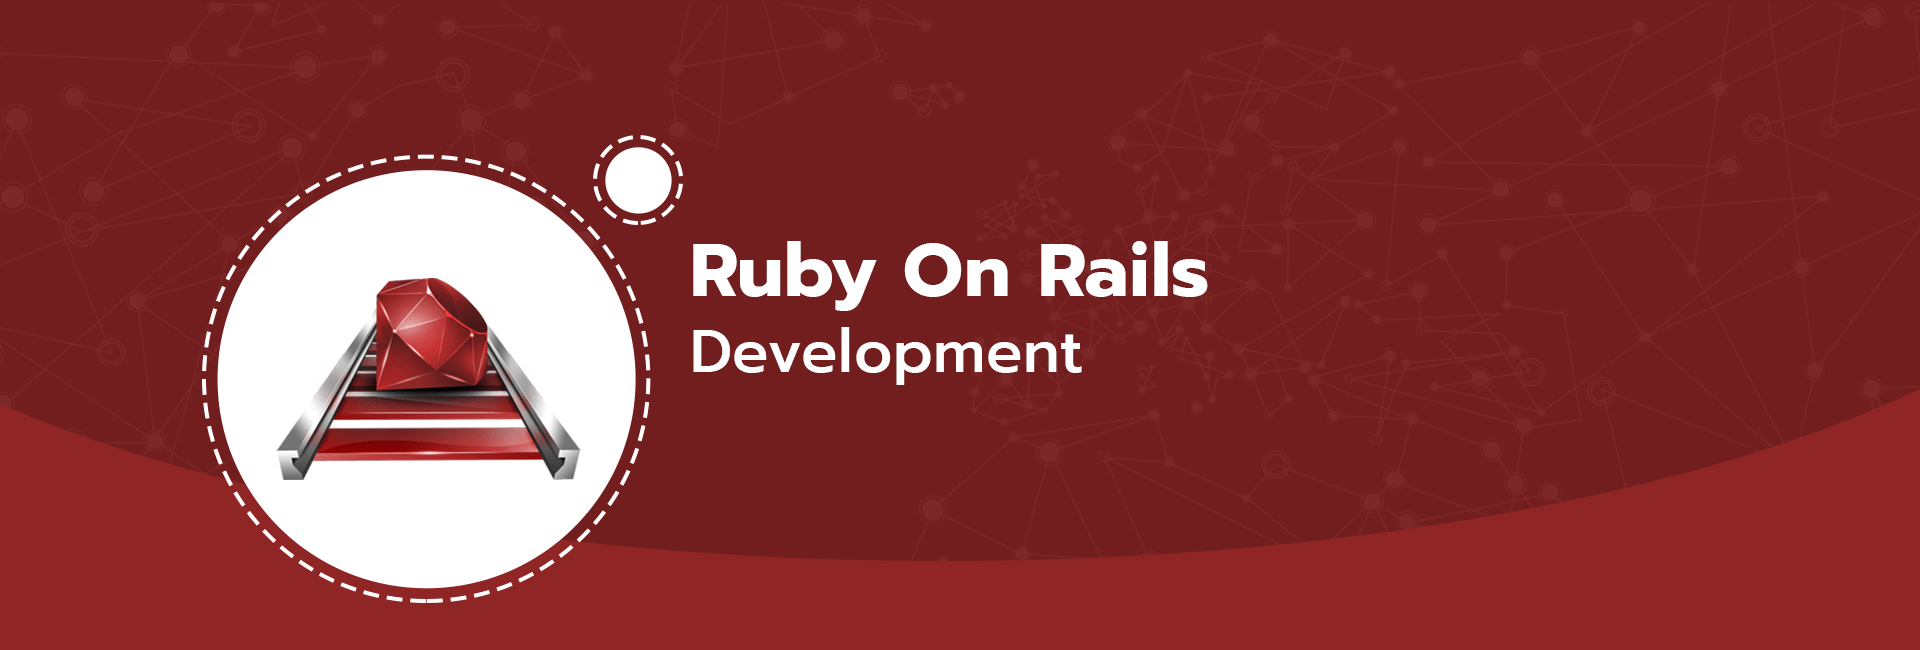 Ruby on Rails Development UK